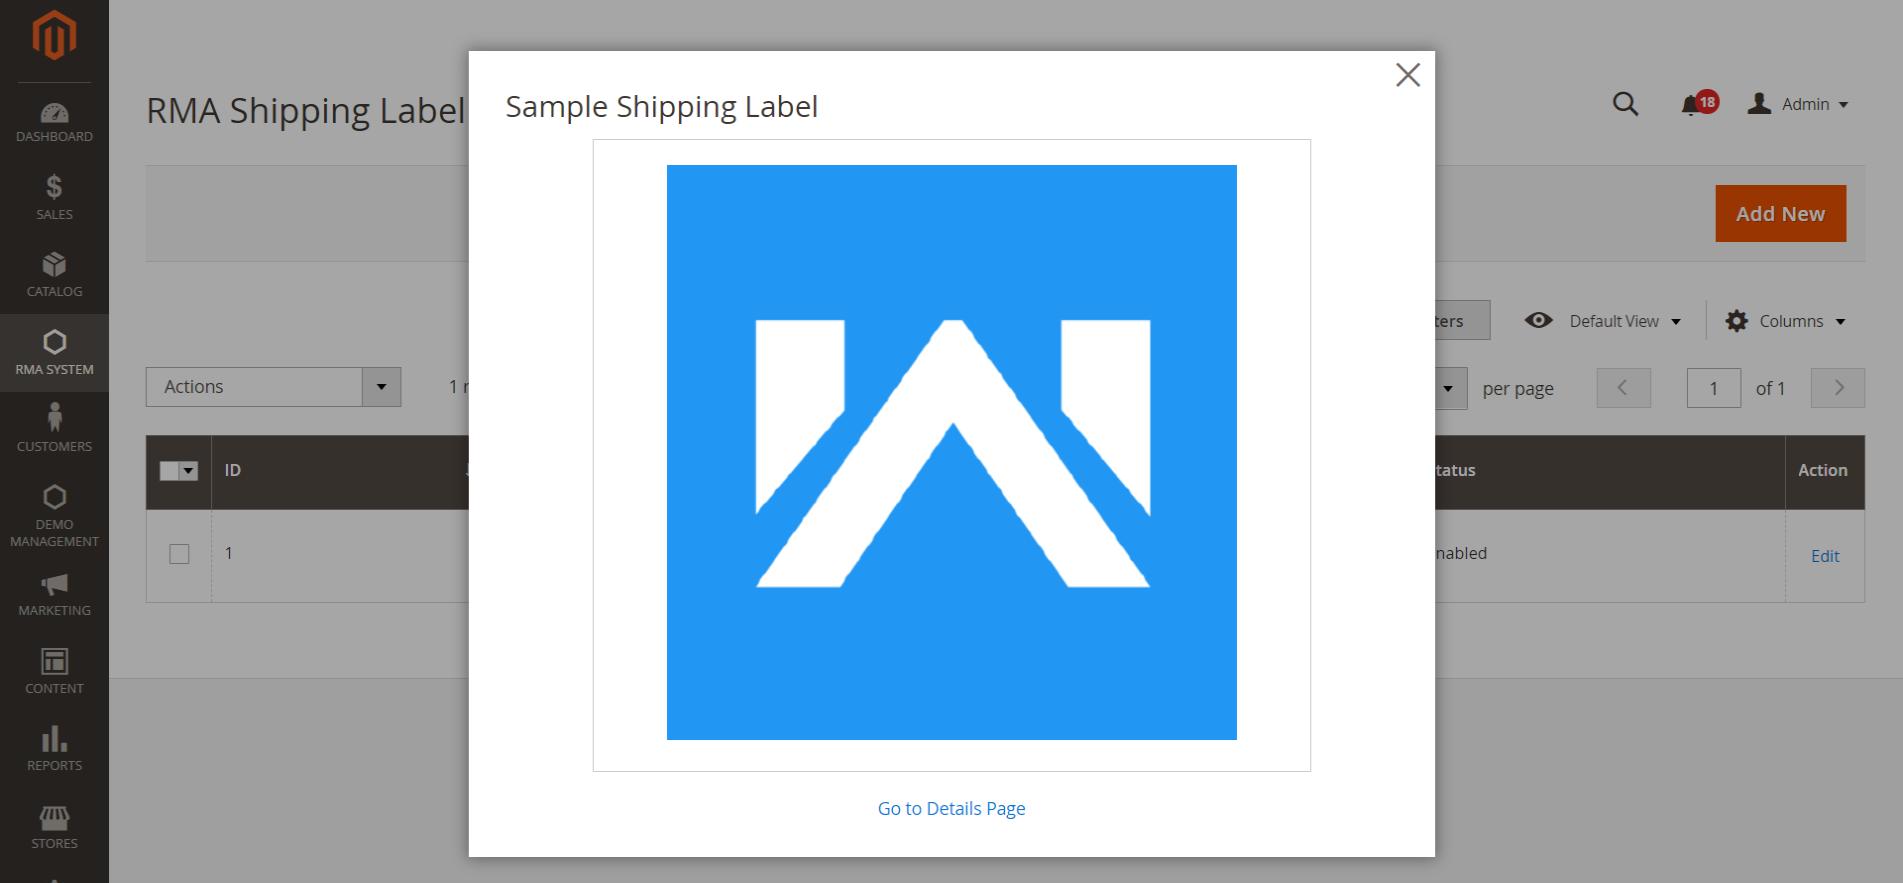 RMA-Shipping-Label-Menu-RMA-System-Magento-Admin-2